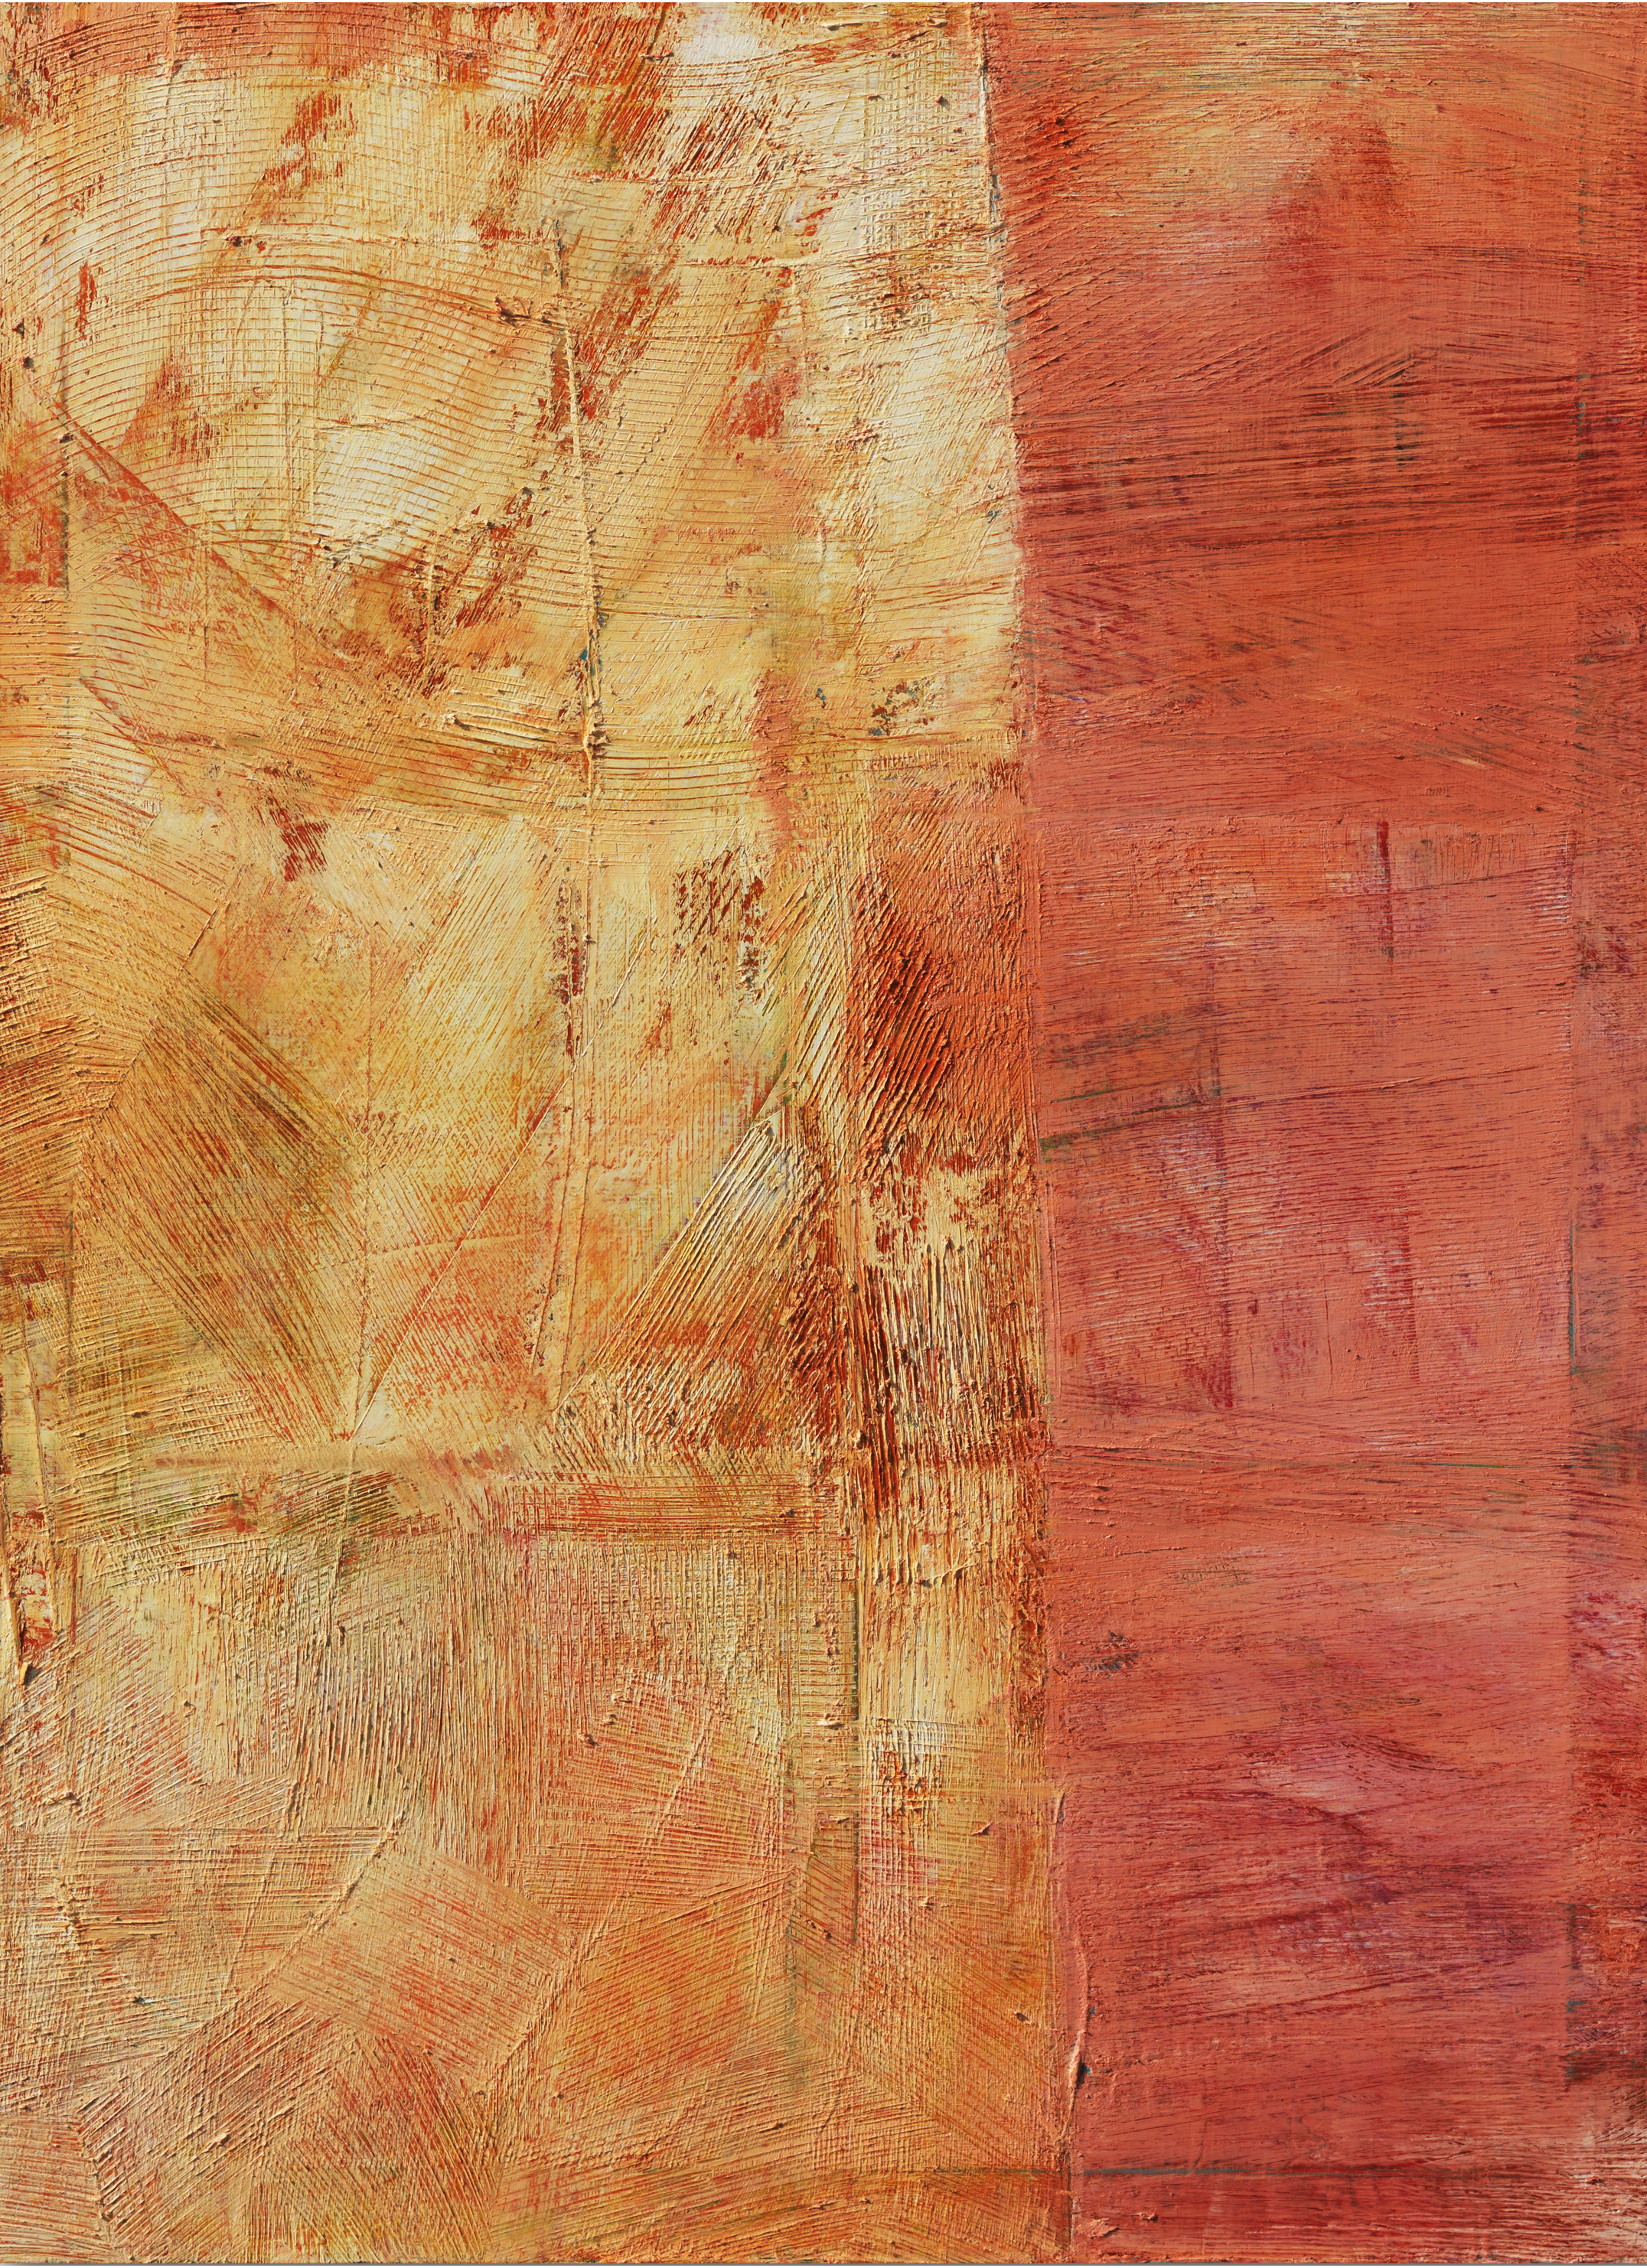 Palimpsest (Orange)